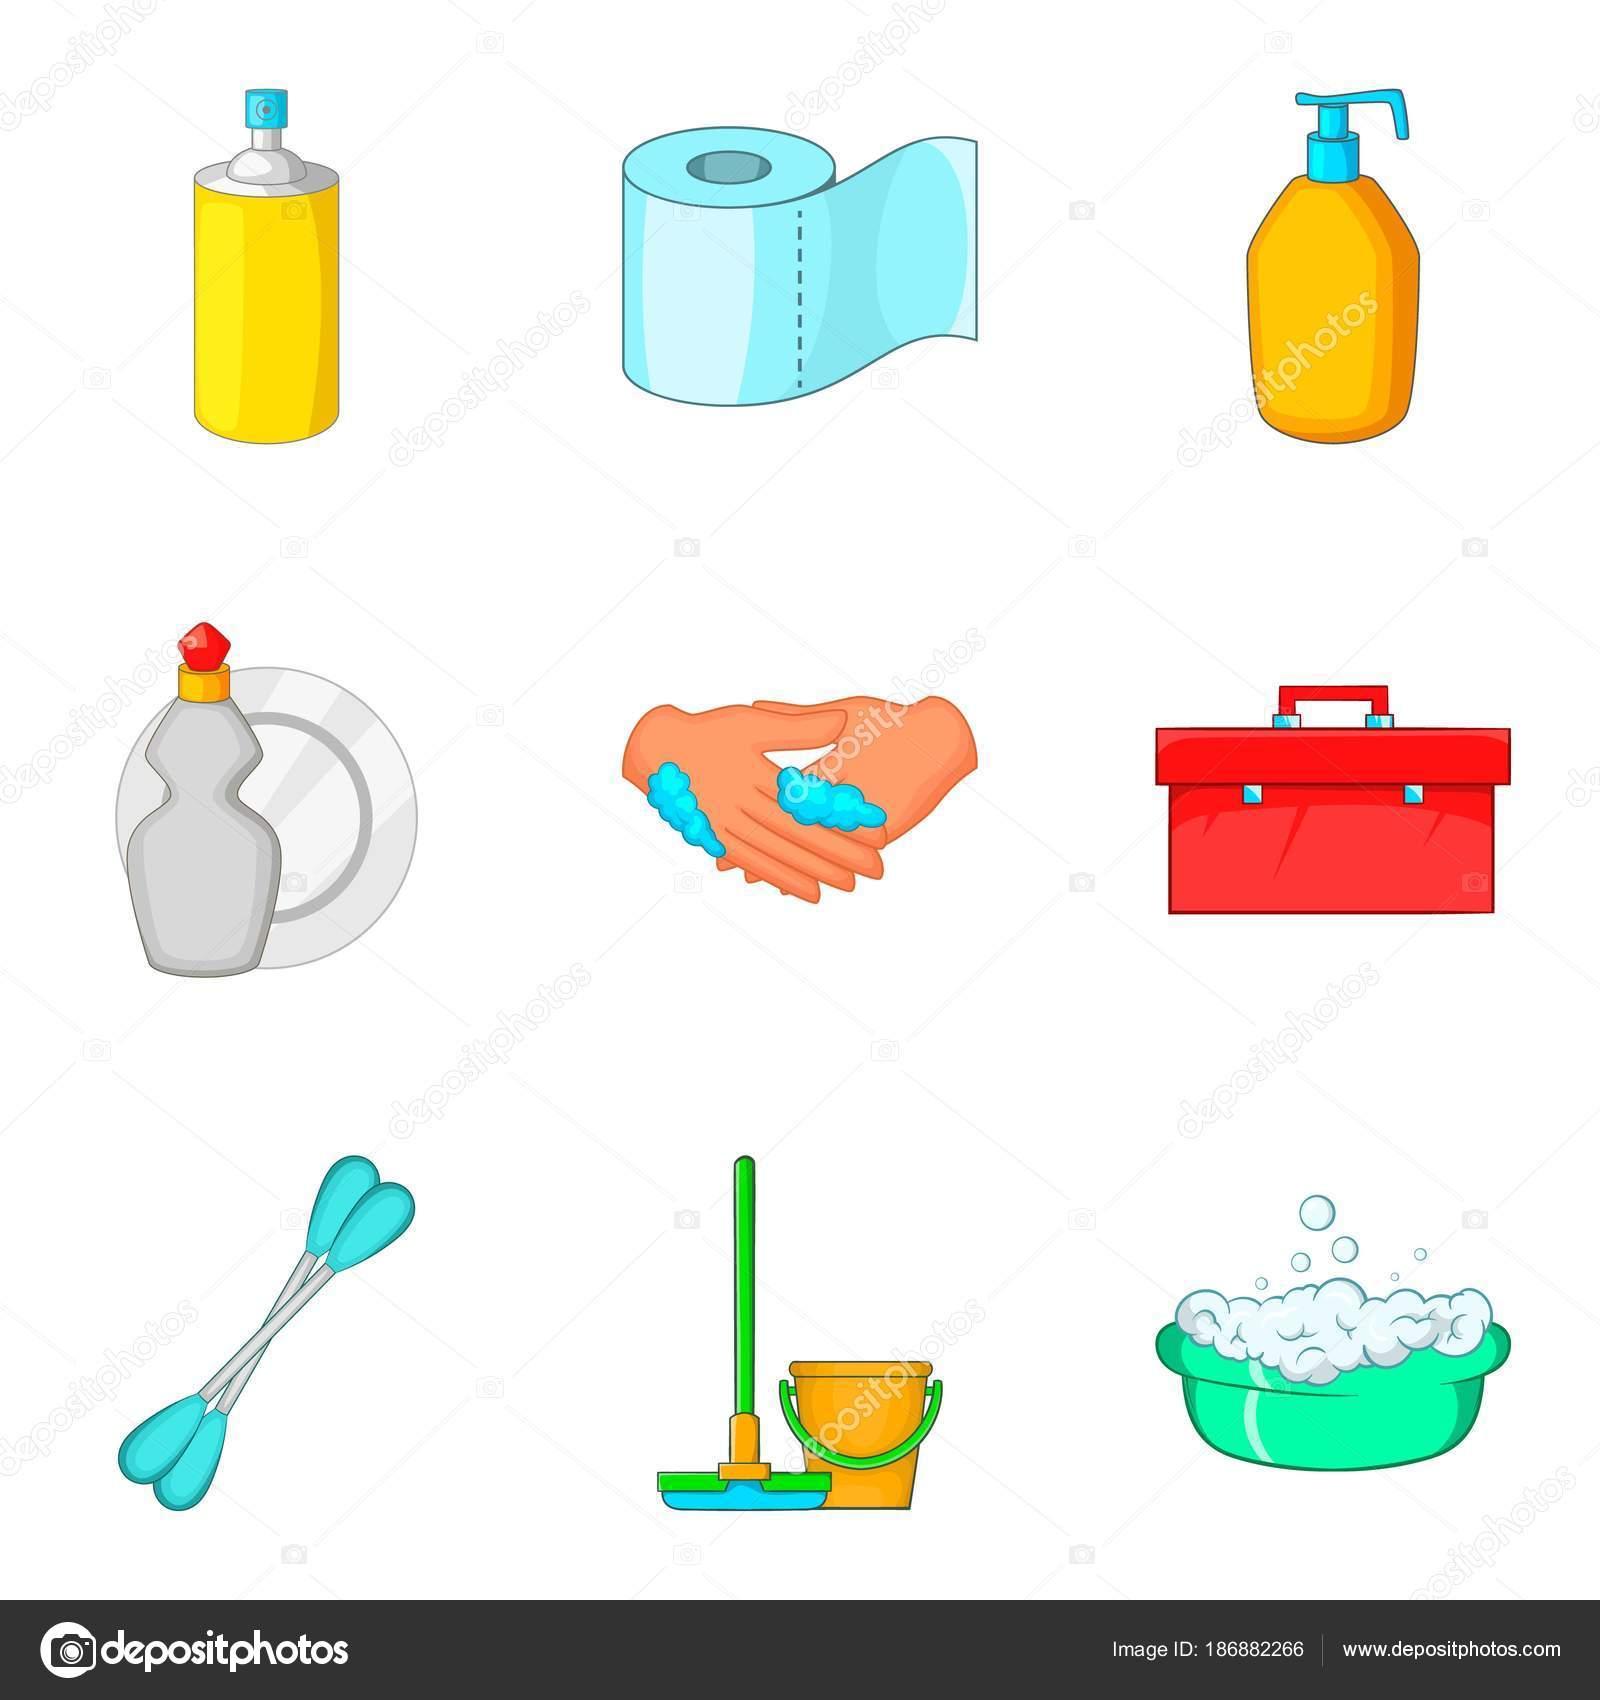 Toiletry Icons Set Cartoon Style Stock Vector C Ylivdesign